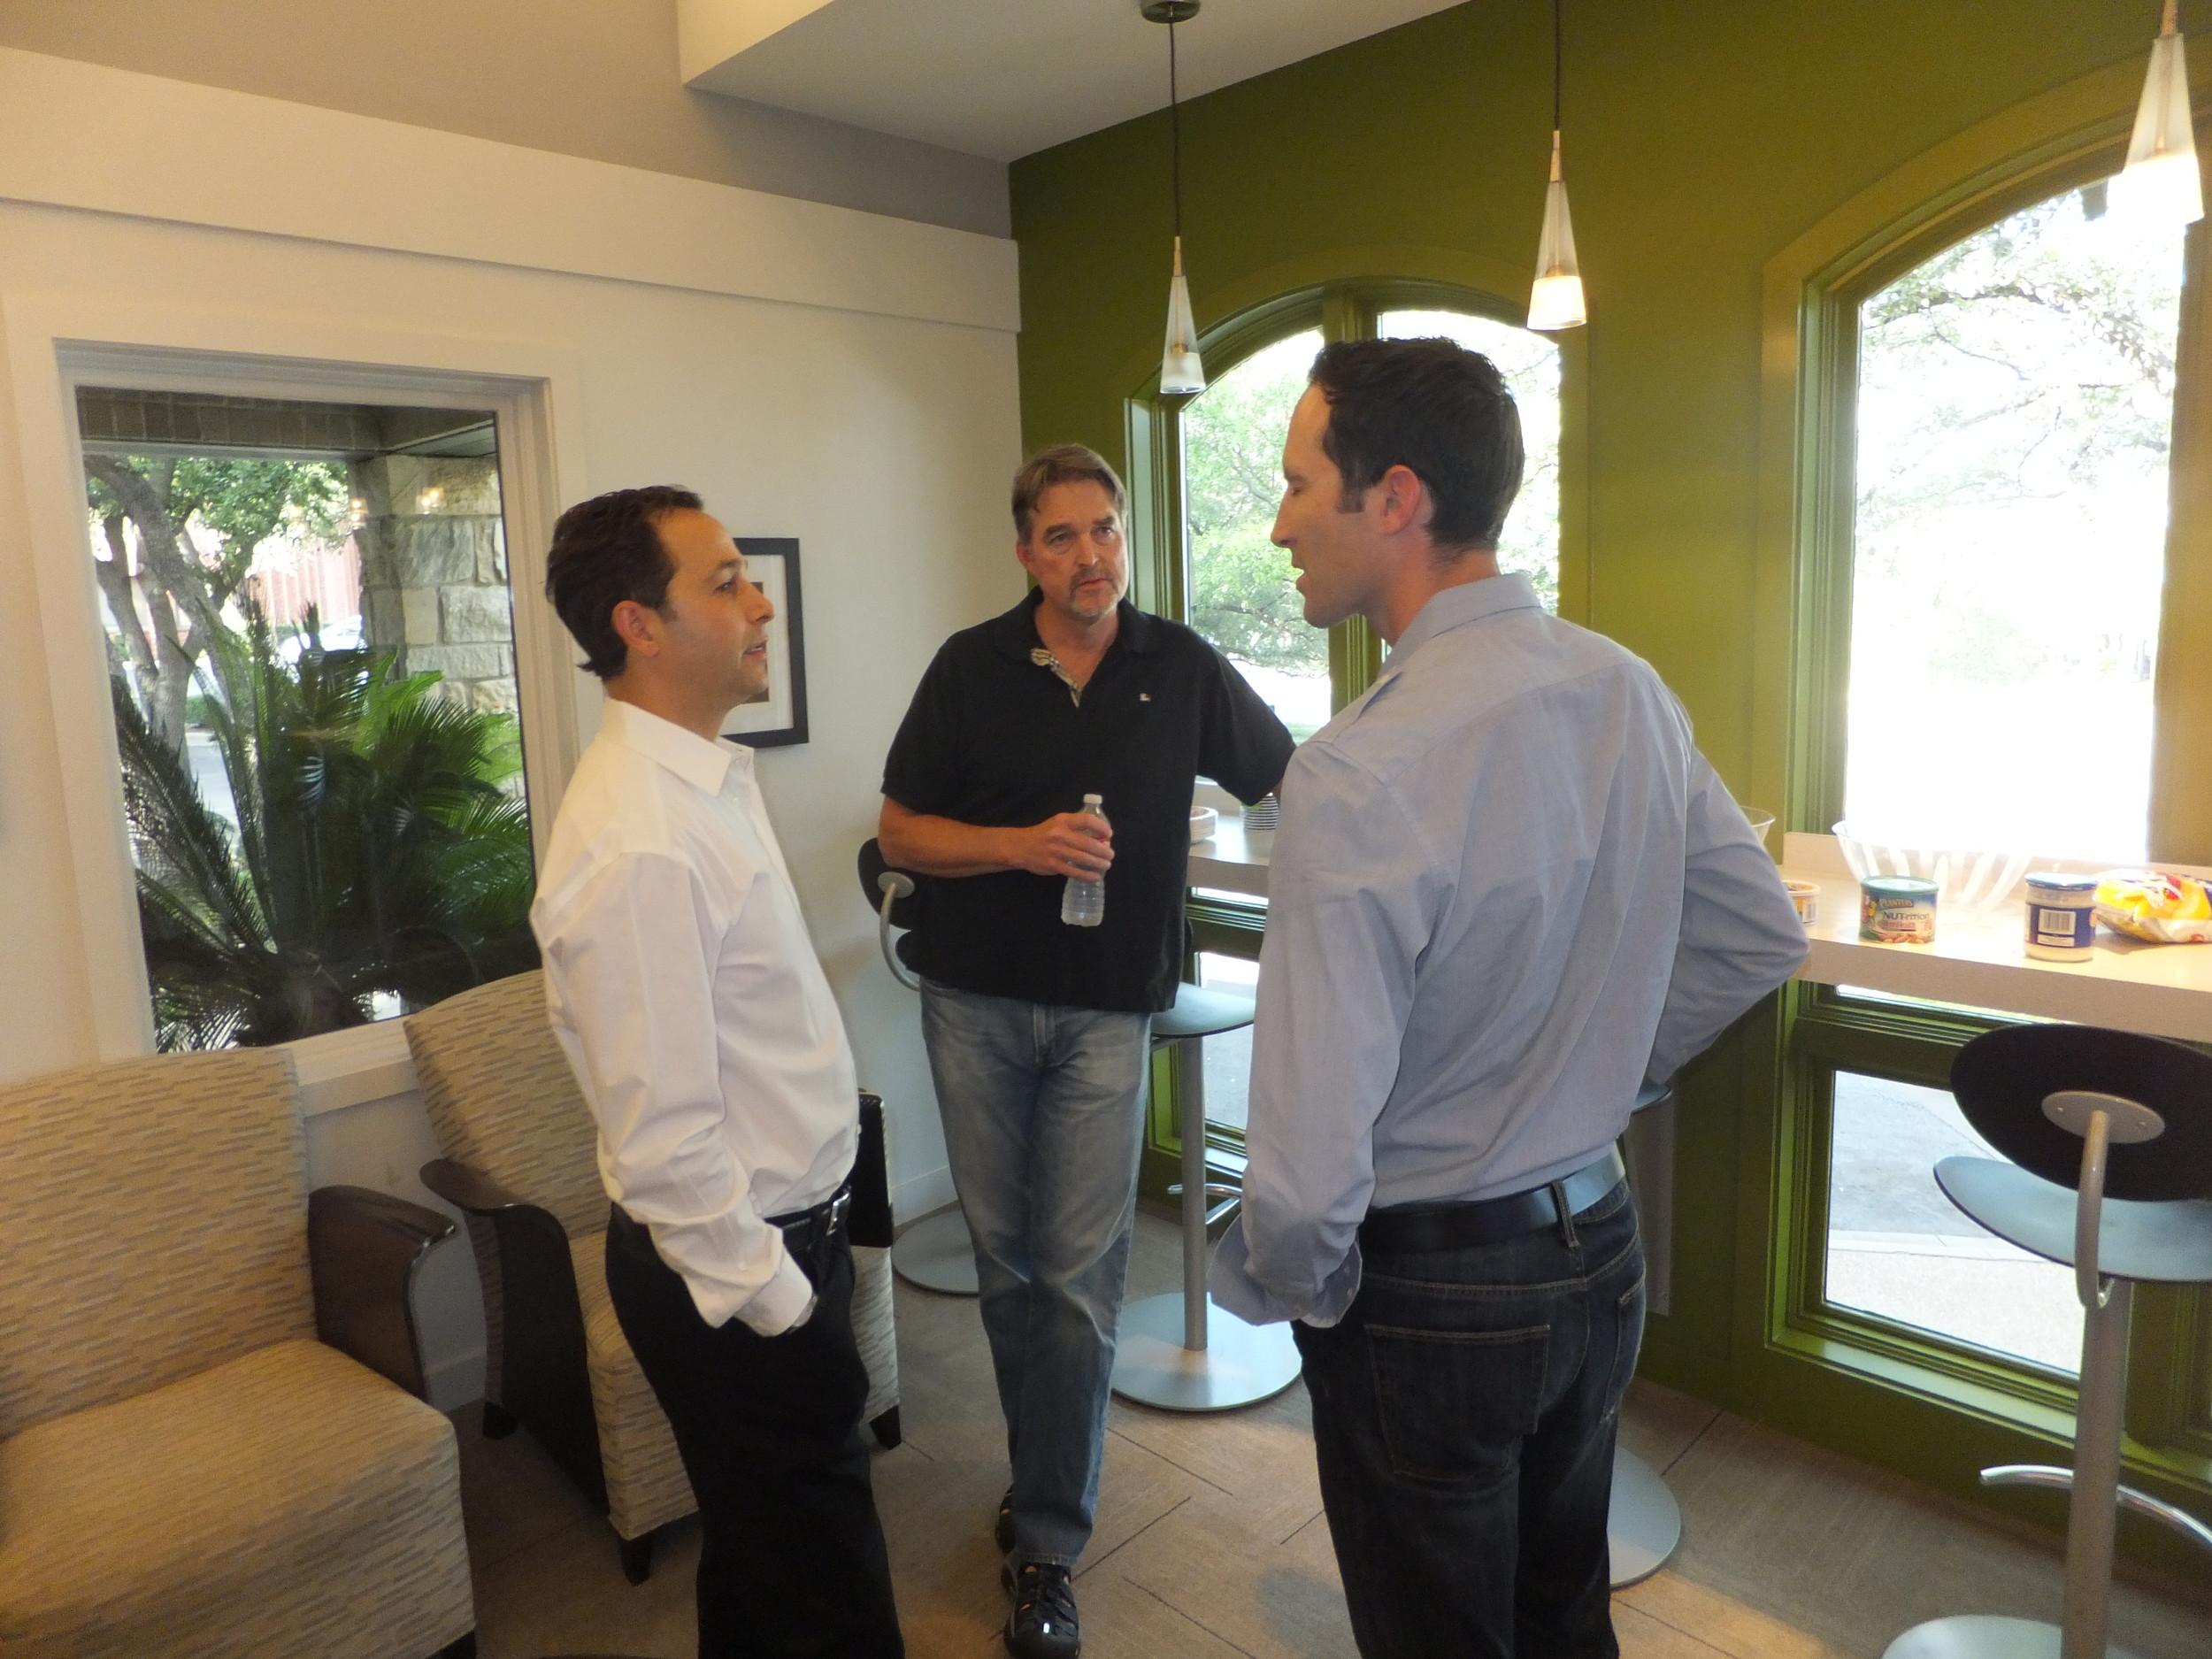 Drs. Randy Kunik, Stephen Robirds and Seth Briggs